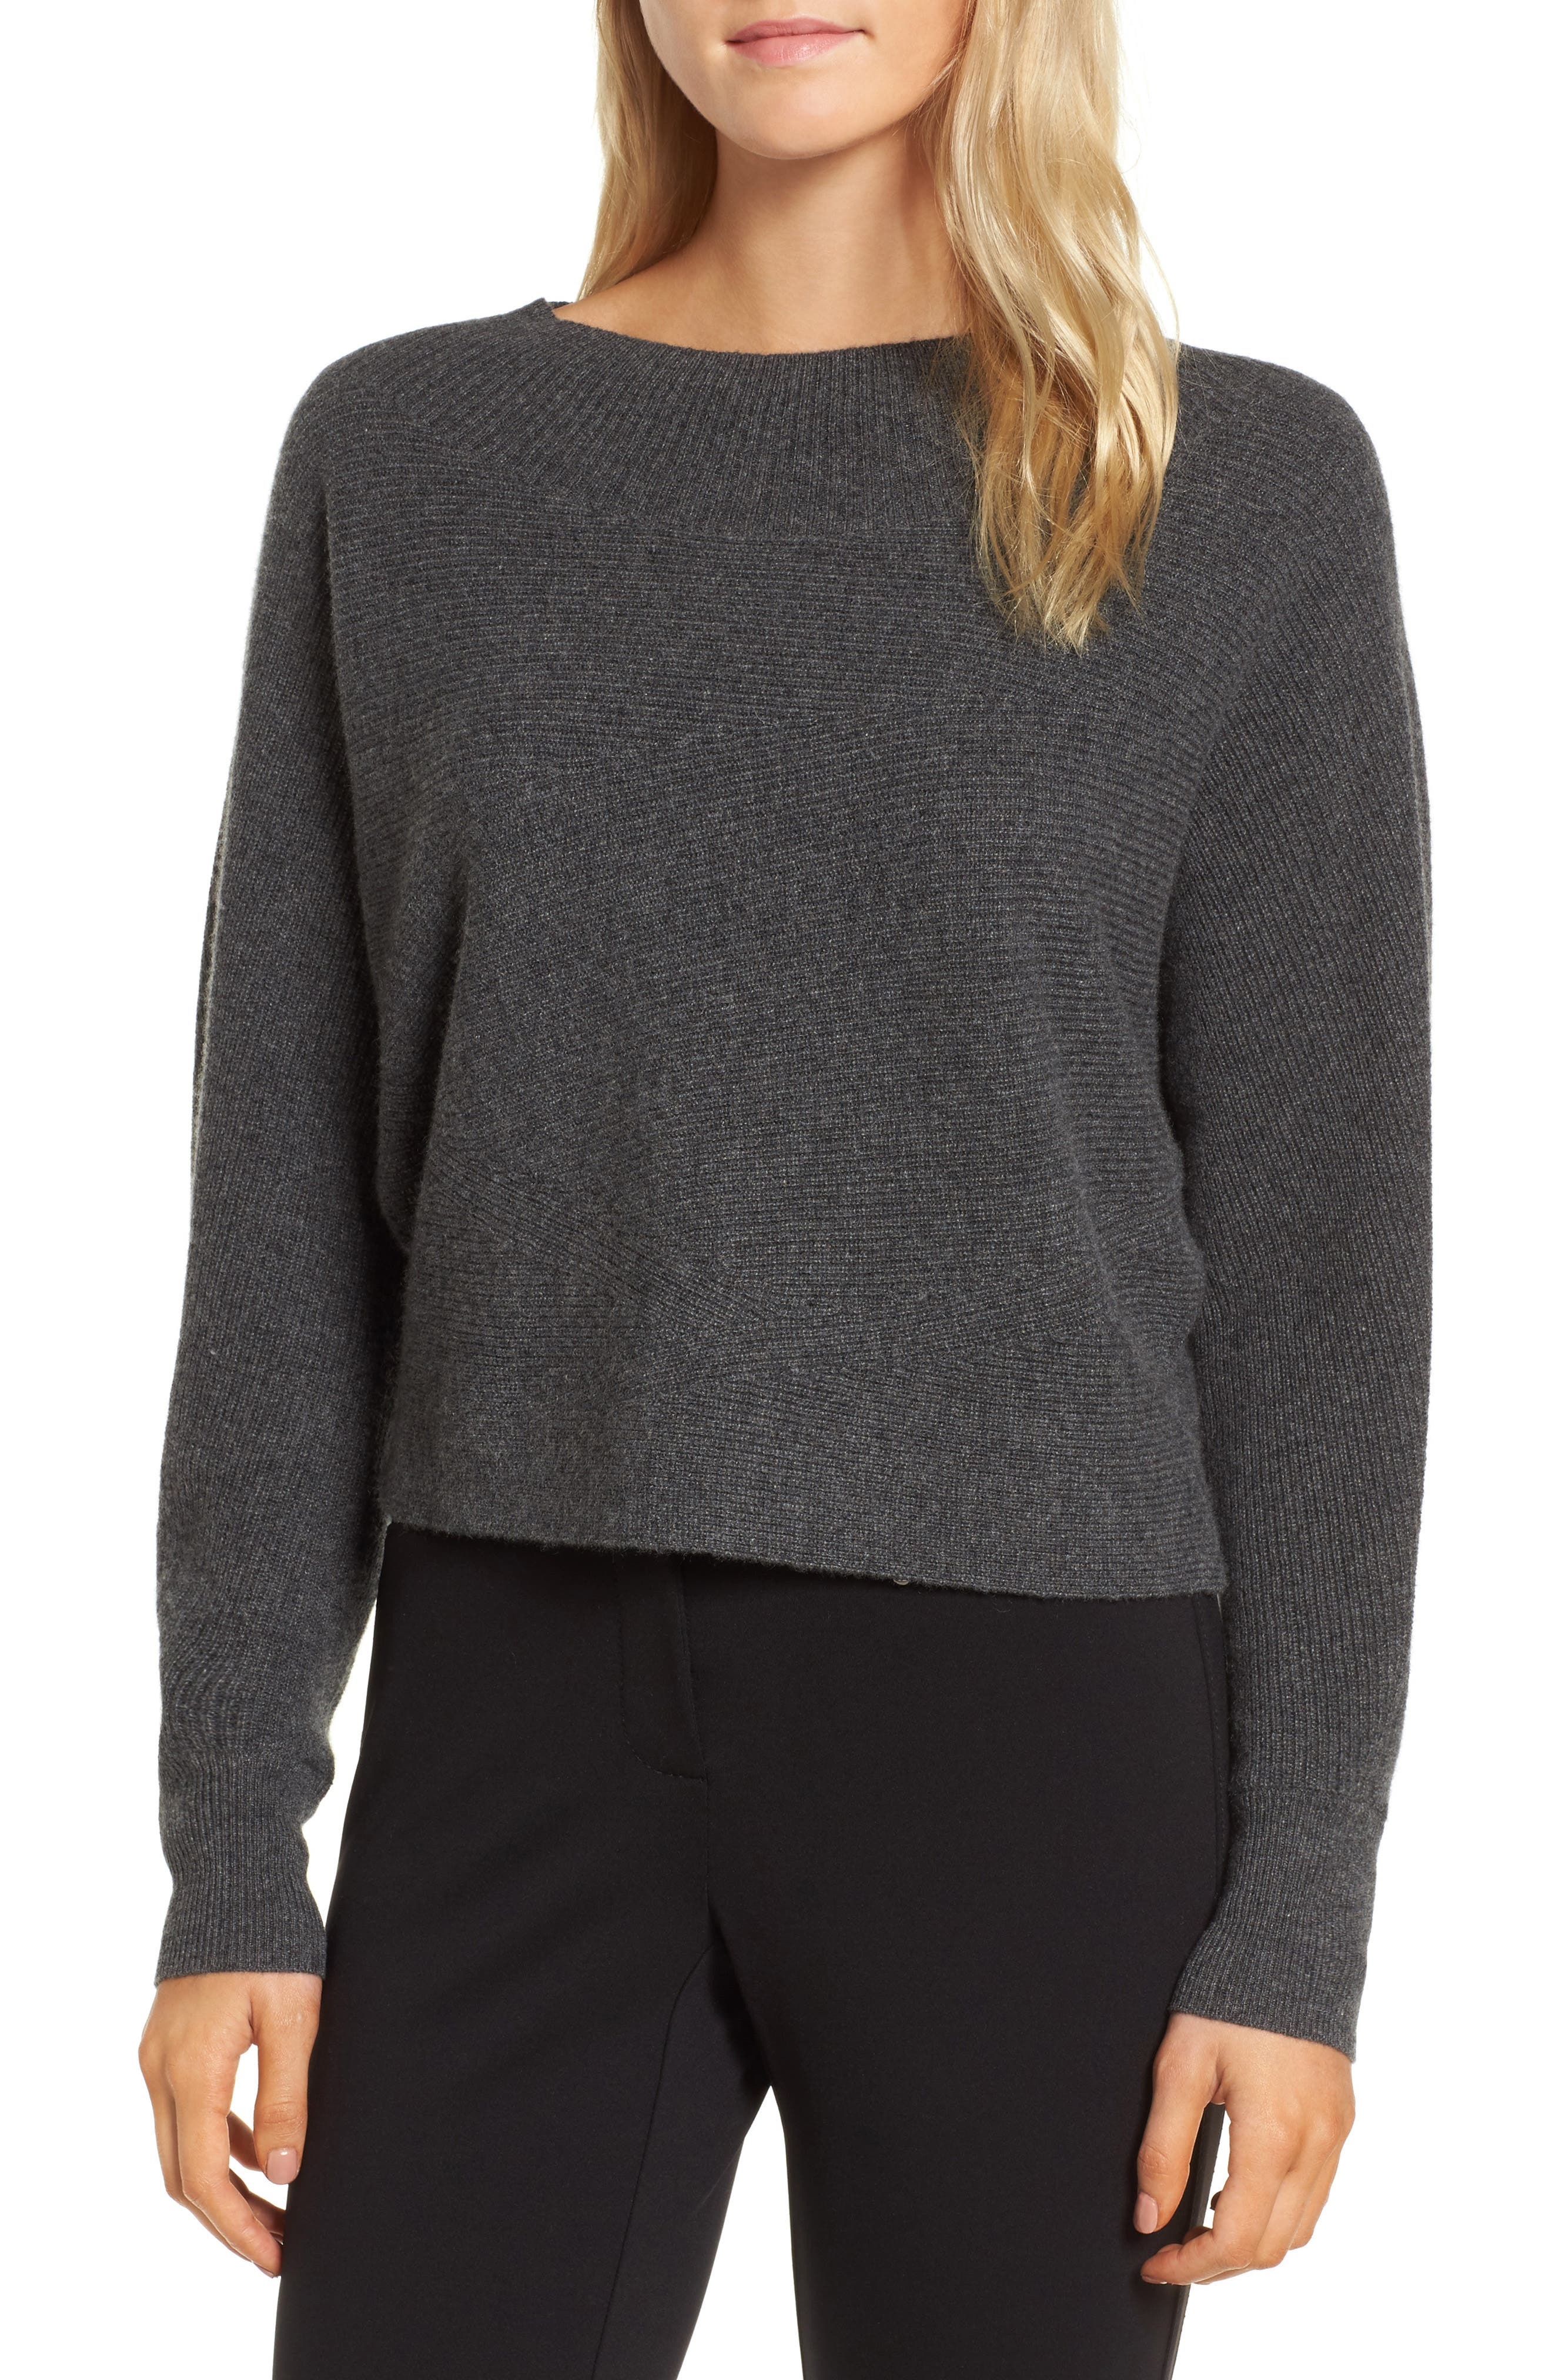 Dolman Sleeve Cashmere Sweater,                             Main thumbnail 1, color,                             Grey Castlerock Heather